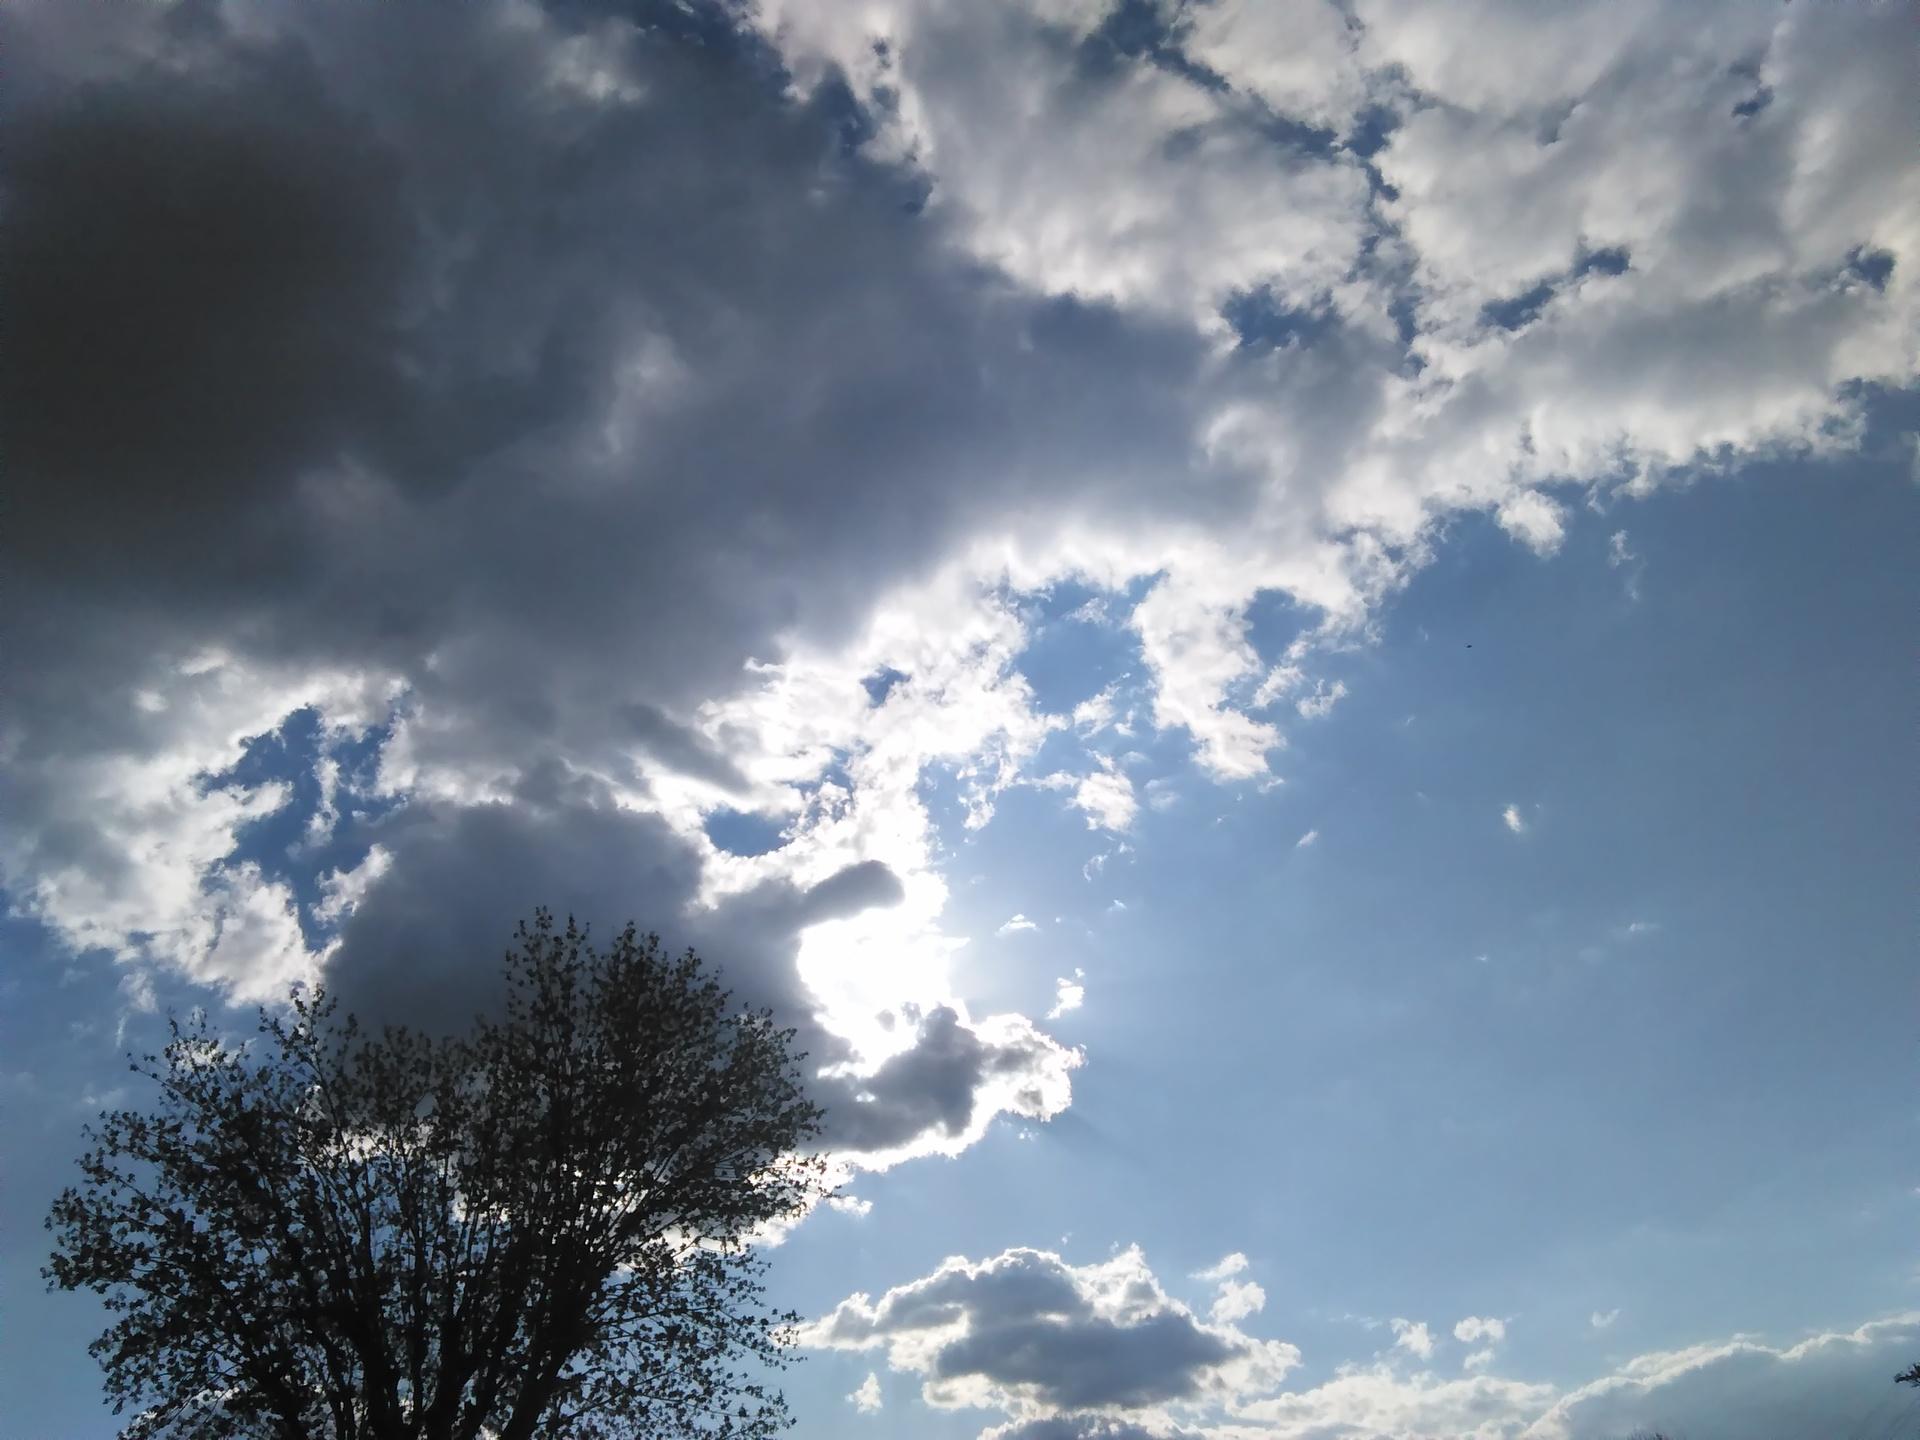 Peekaboo sun | codenamesailorearth, background, heaven, idyllic